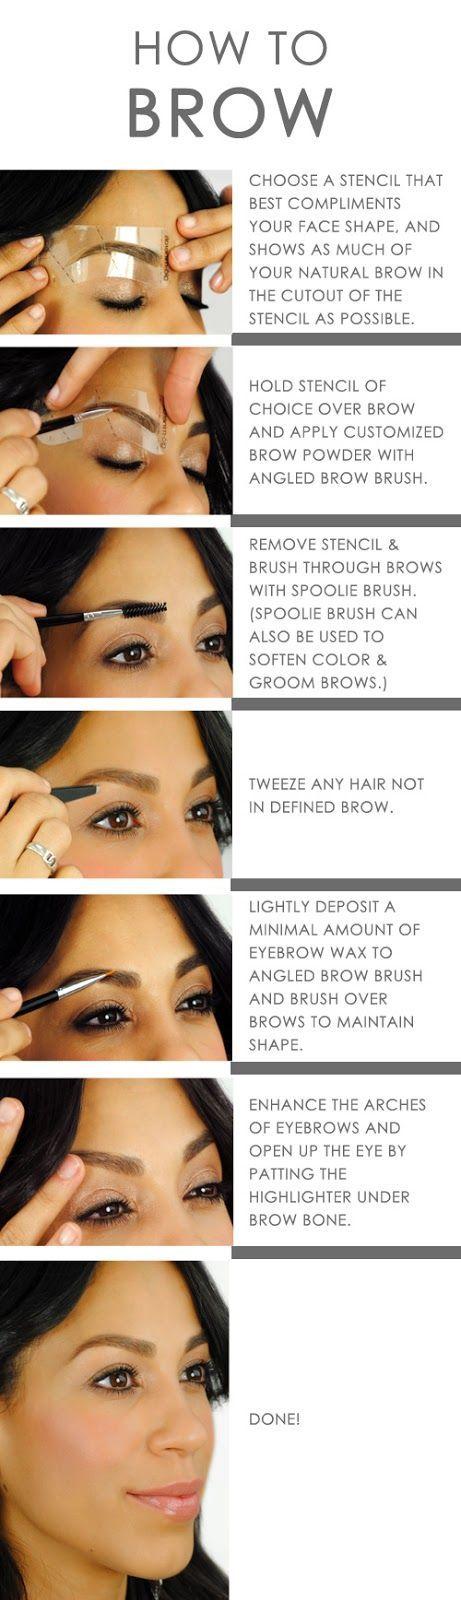 Eyebrow Tutorials   How To   DIY  Makeup   Perfect Eyebrows   Filling In Eyebrows   Brow Arch   Eyebrows